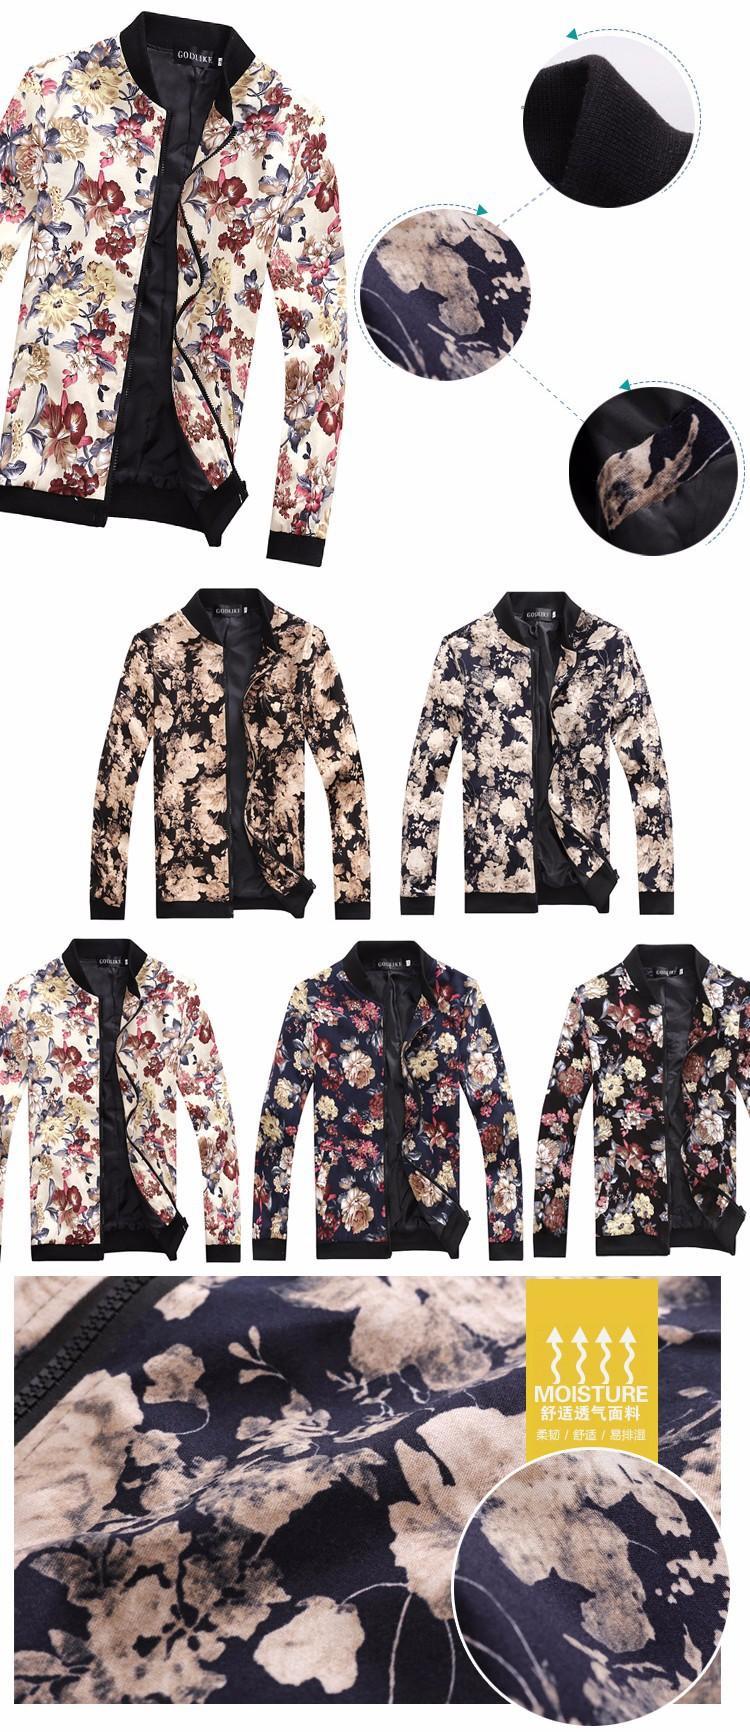 HTB1BowzLXXXXXcoXFXXq6xXFXXXA - 2015 brand Men's Slim jacquard jacket coat autumn fashion leisure wild cardigan stylish floral jacket men